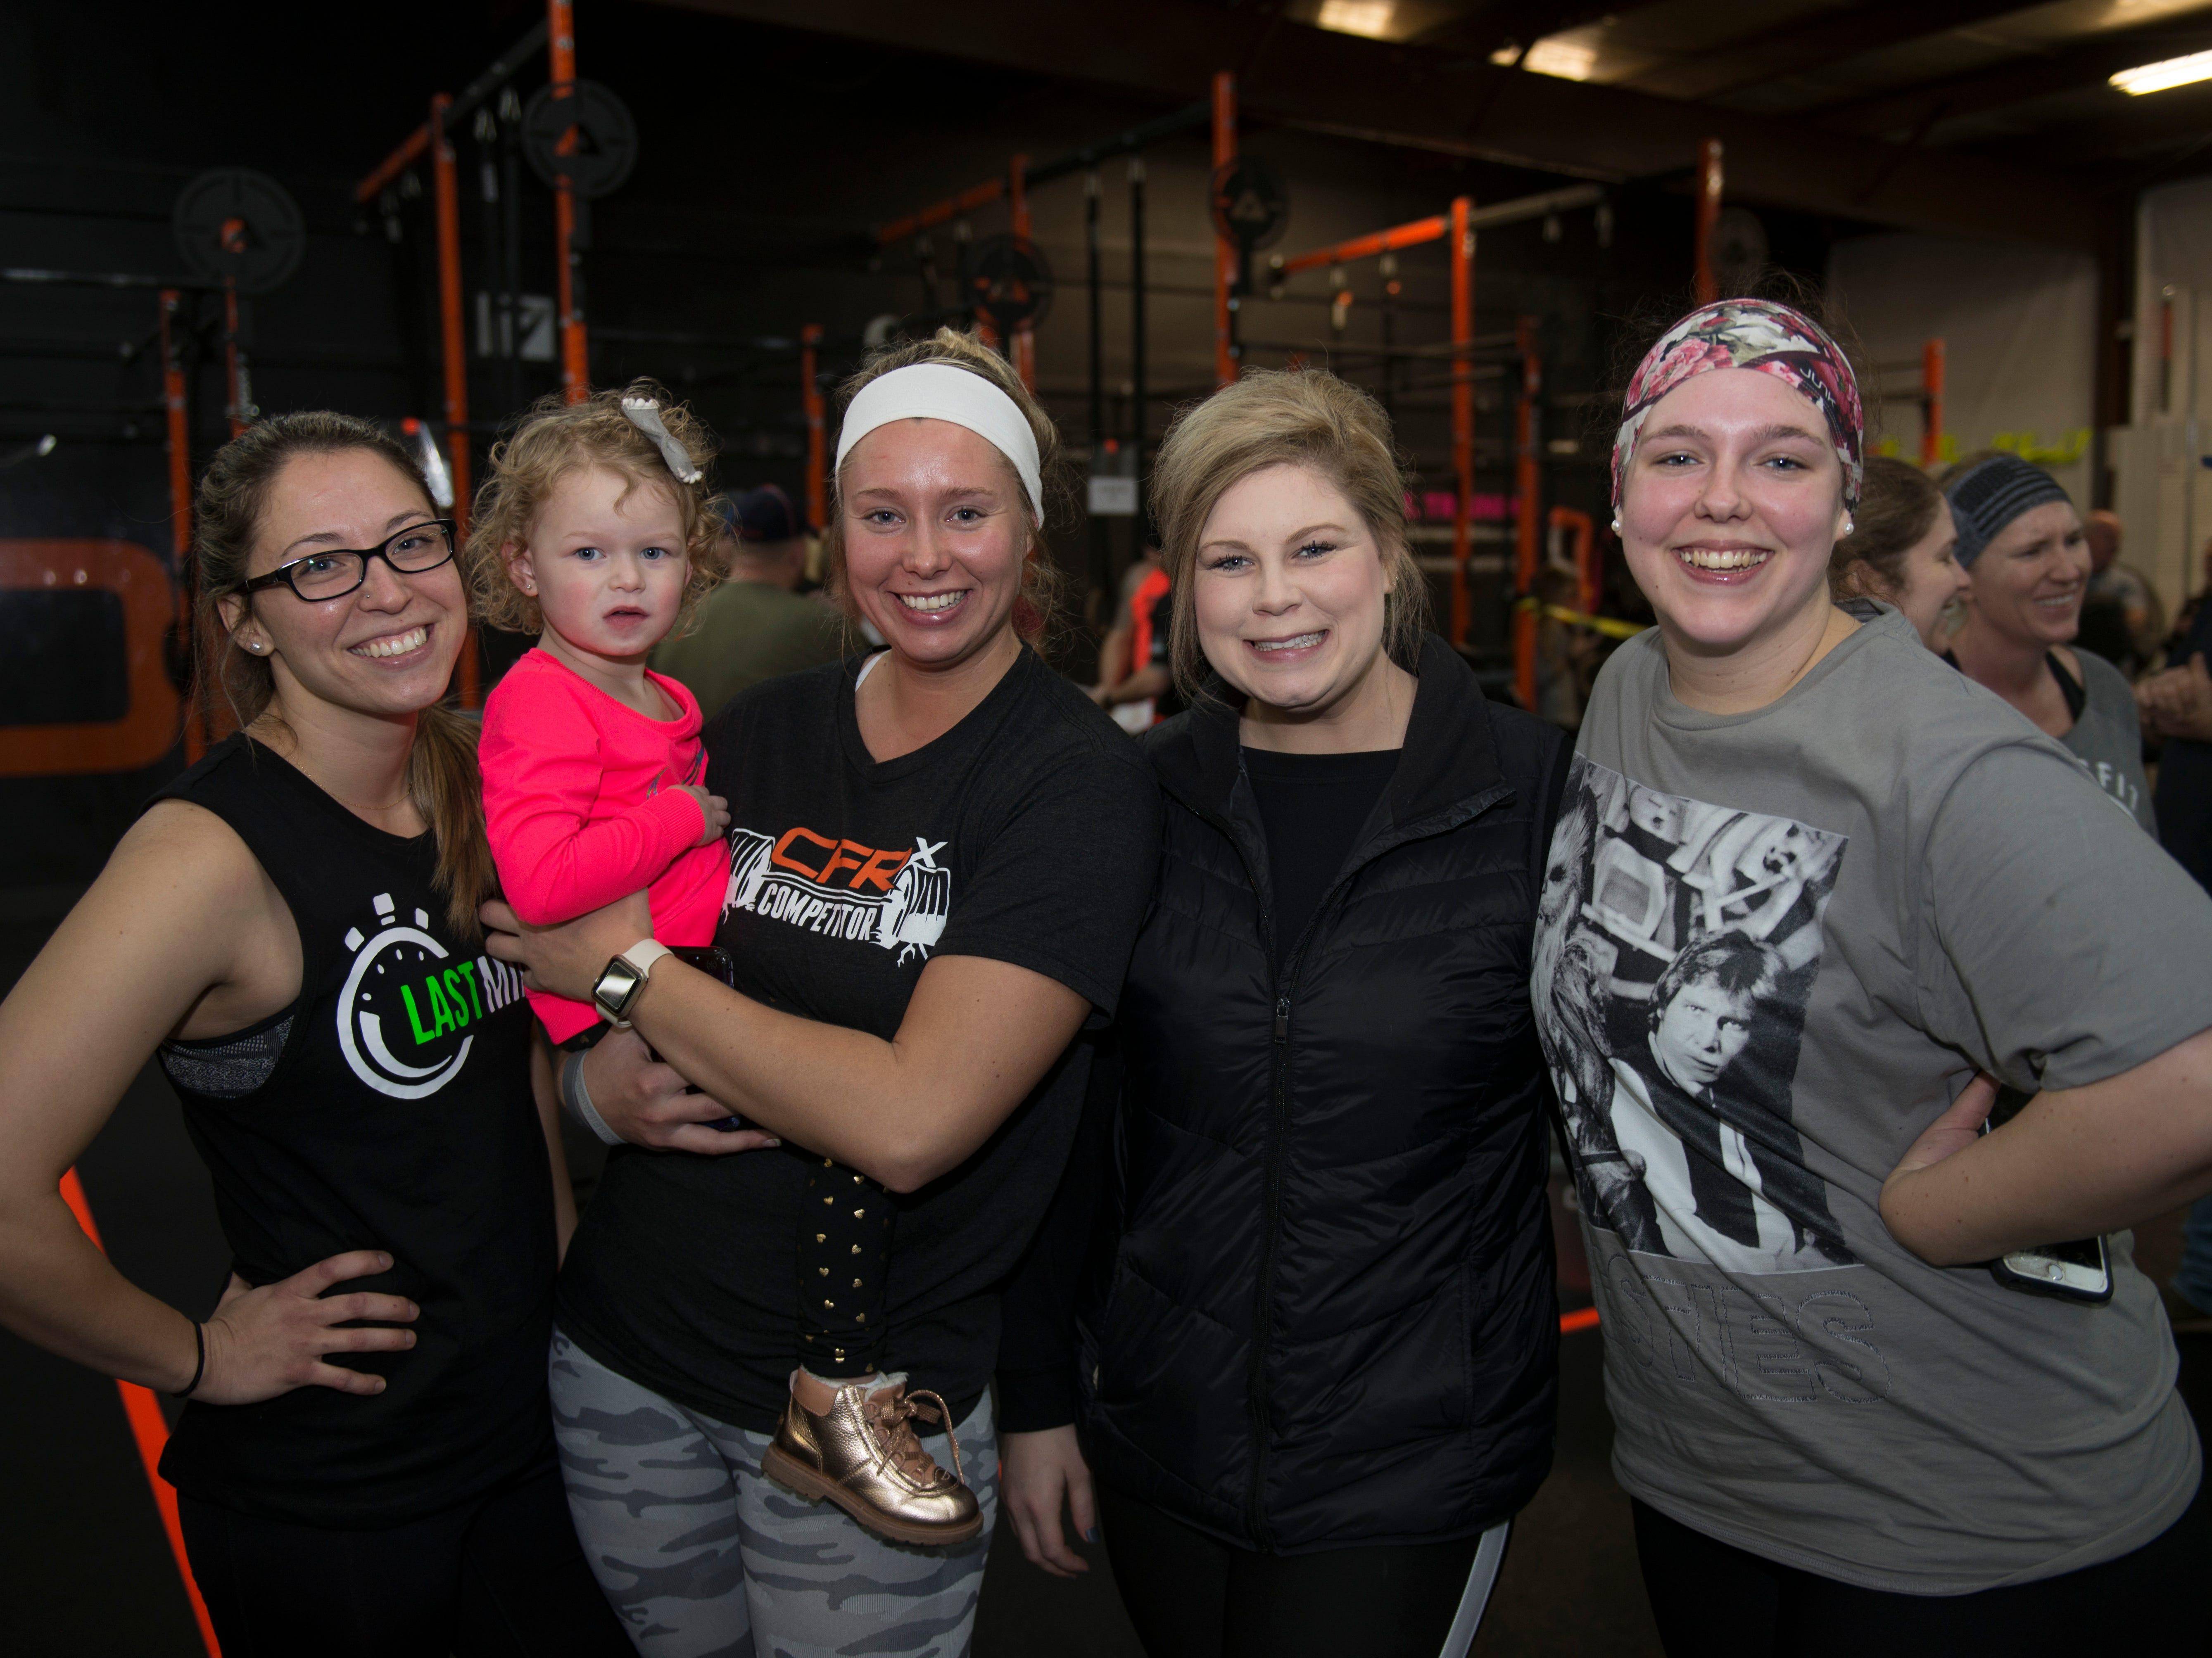 Ashley, Ashley, Ashley, Ashley and Nora